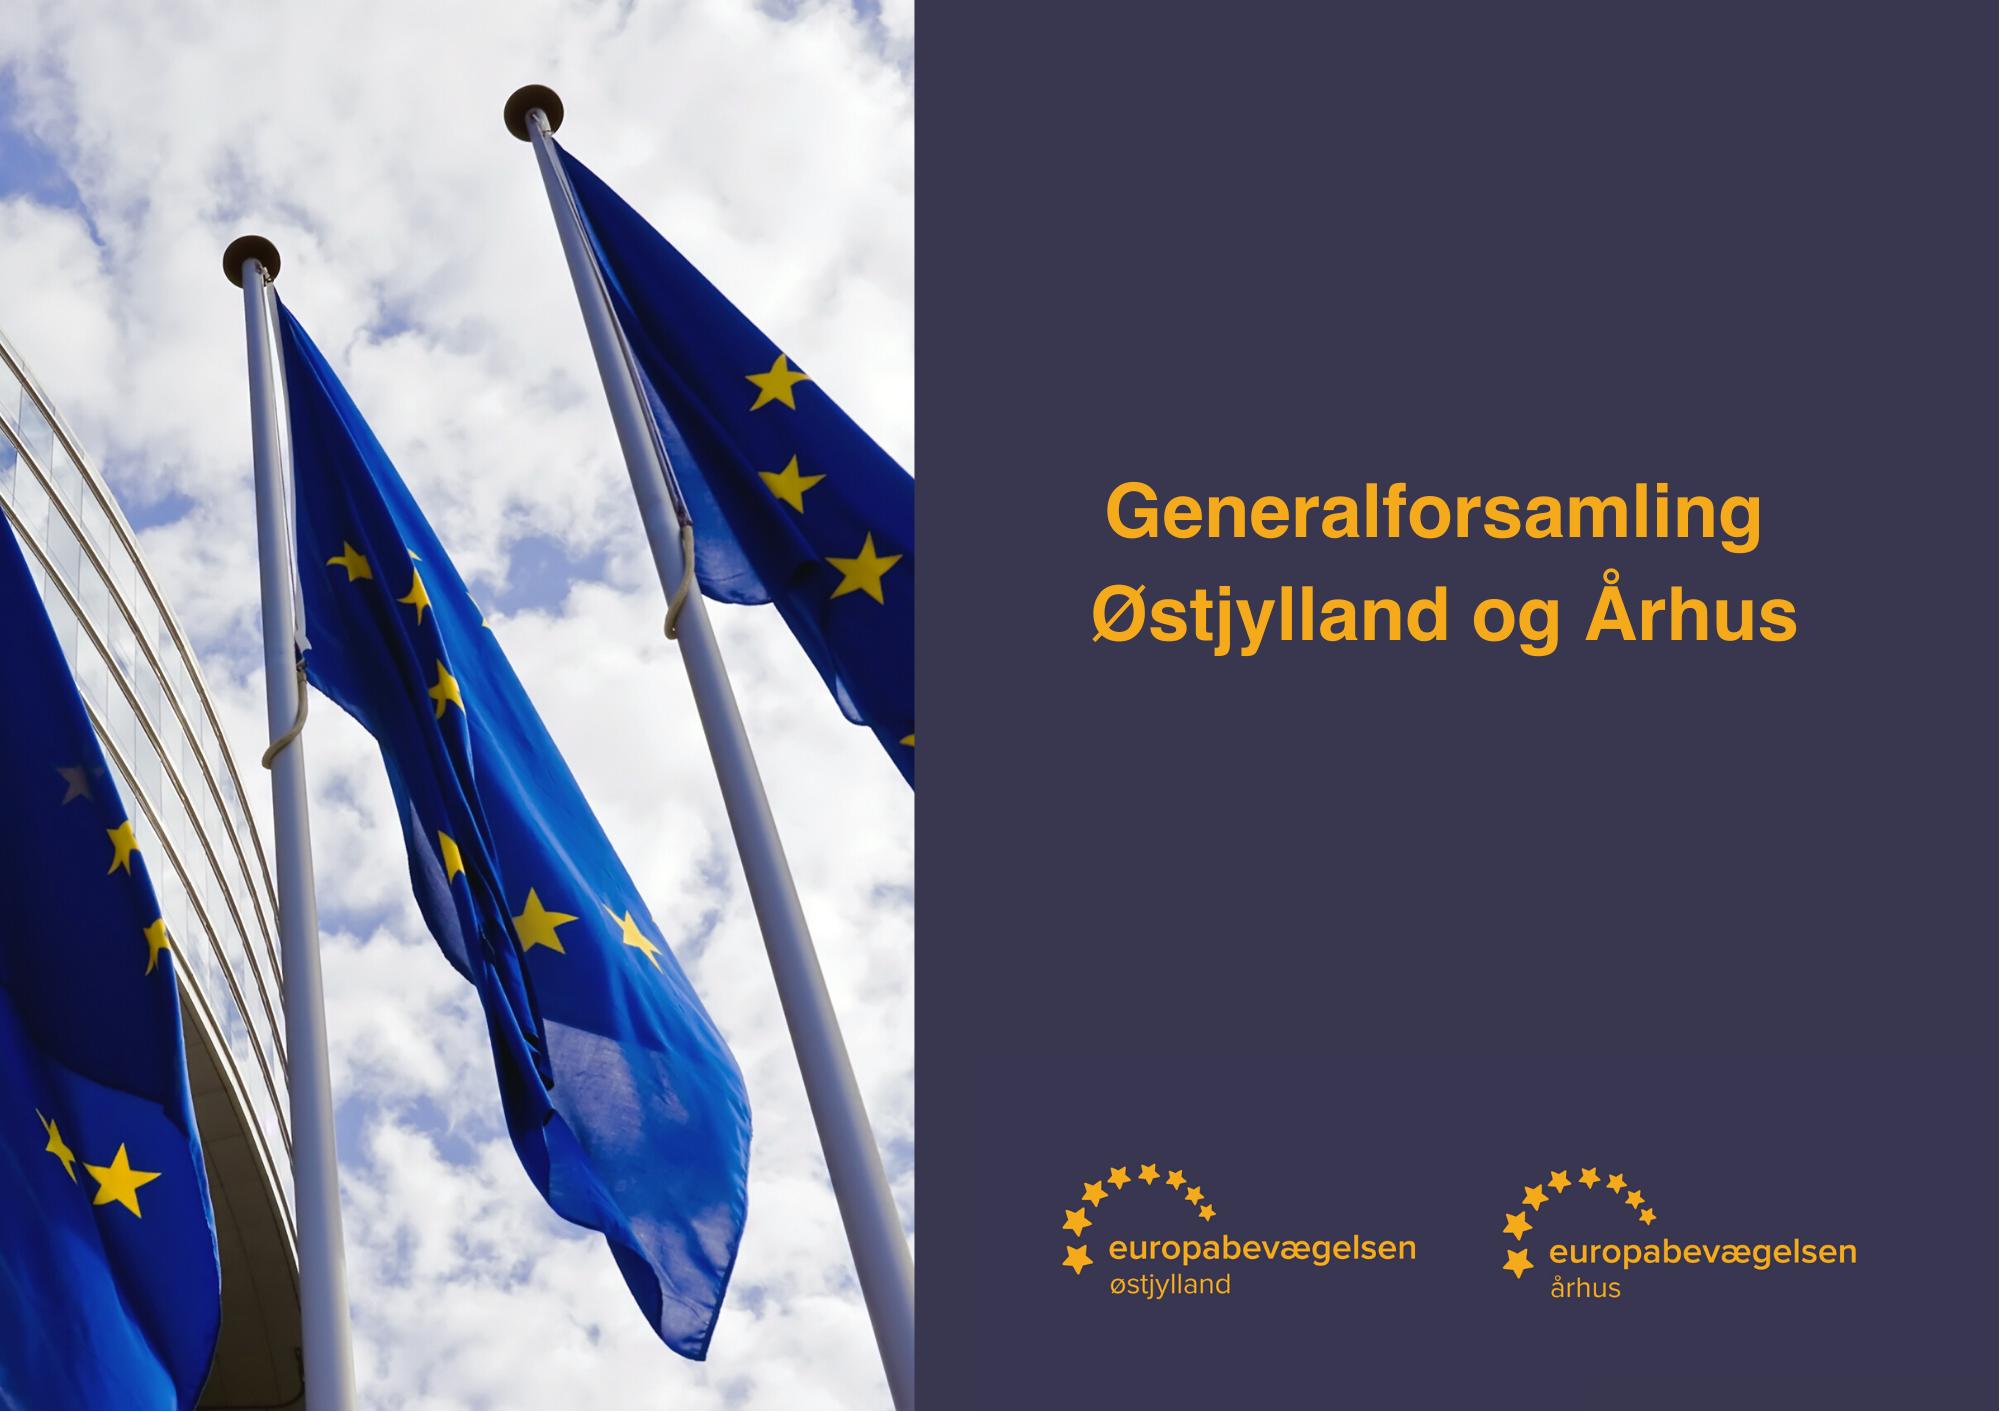 Europabevægelsen Østjylland og Århus